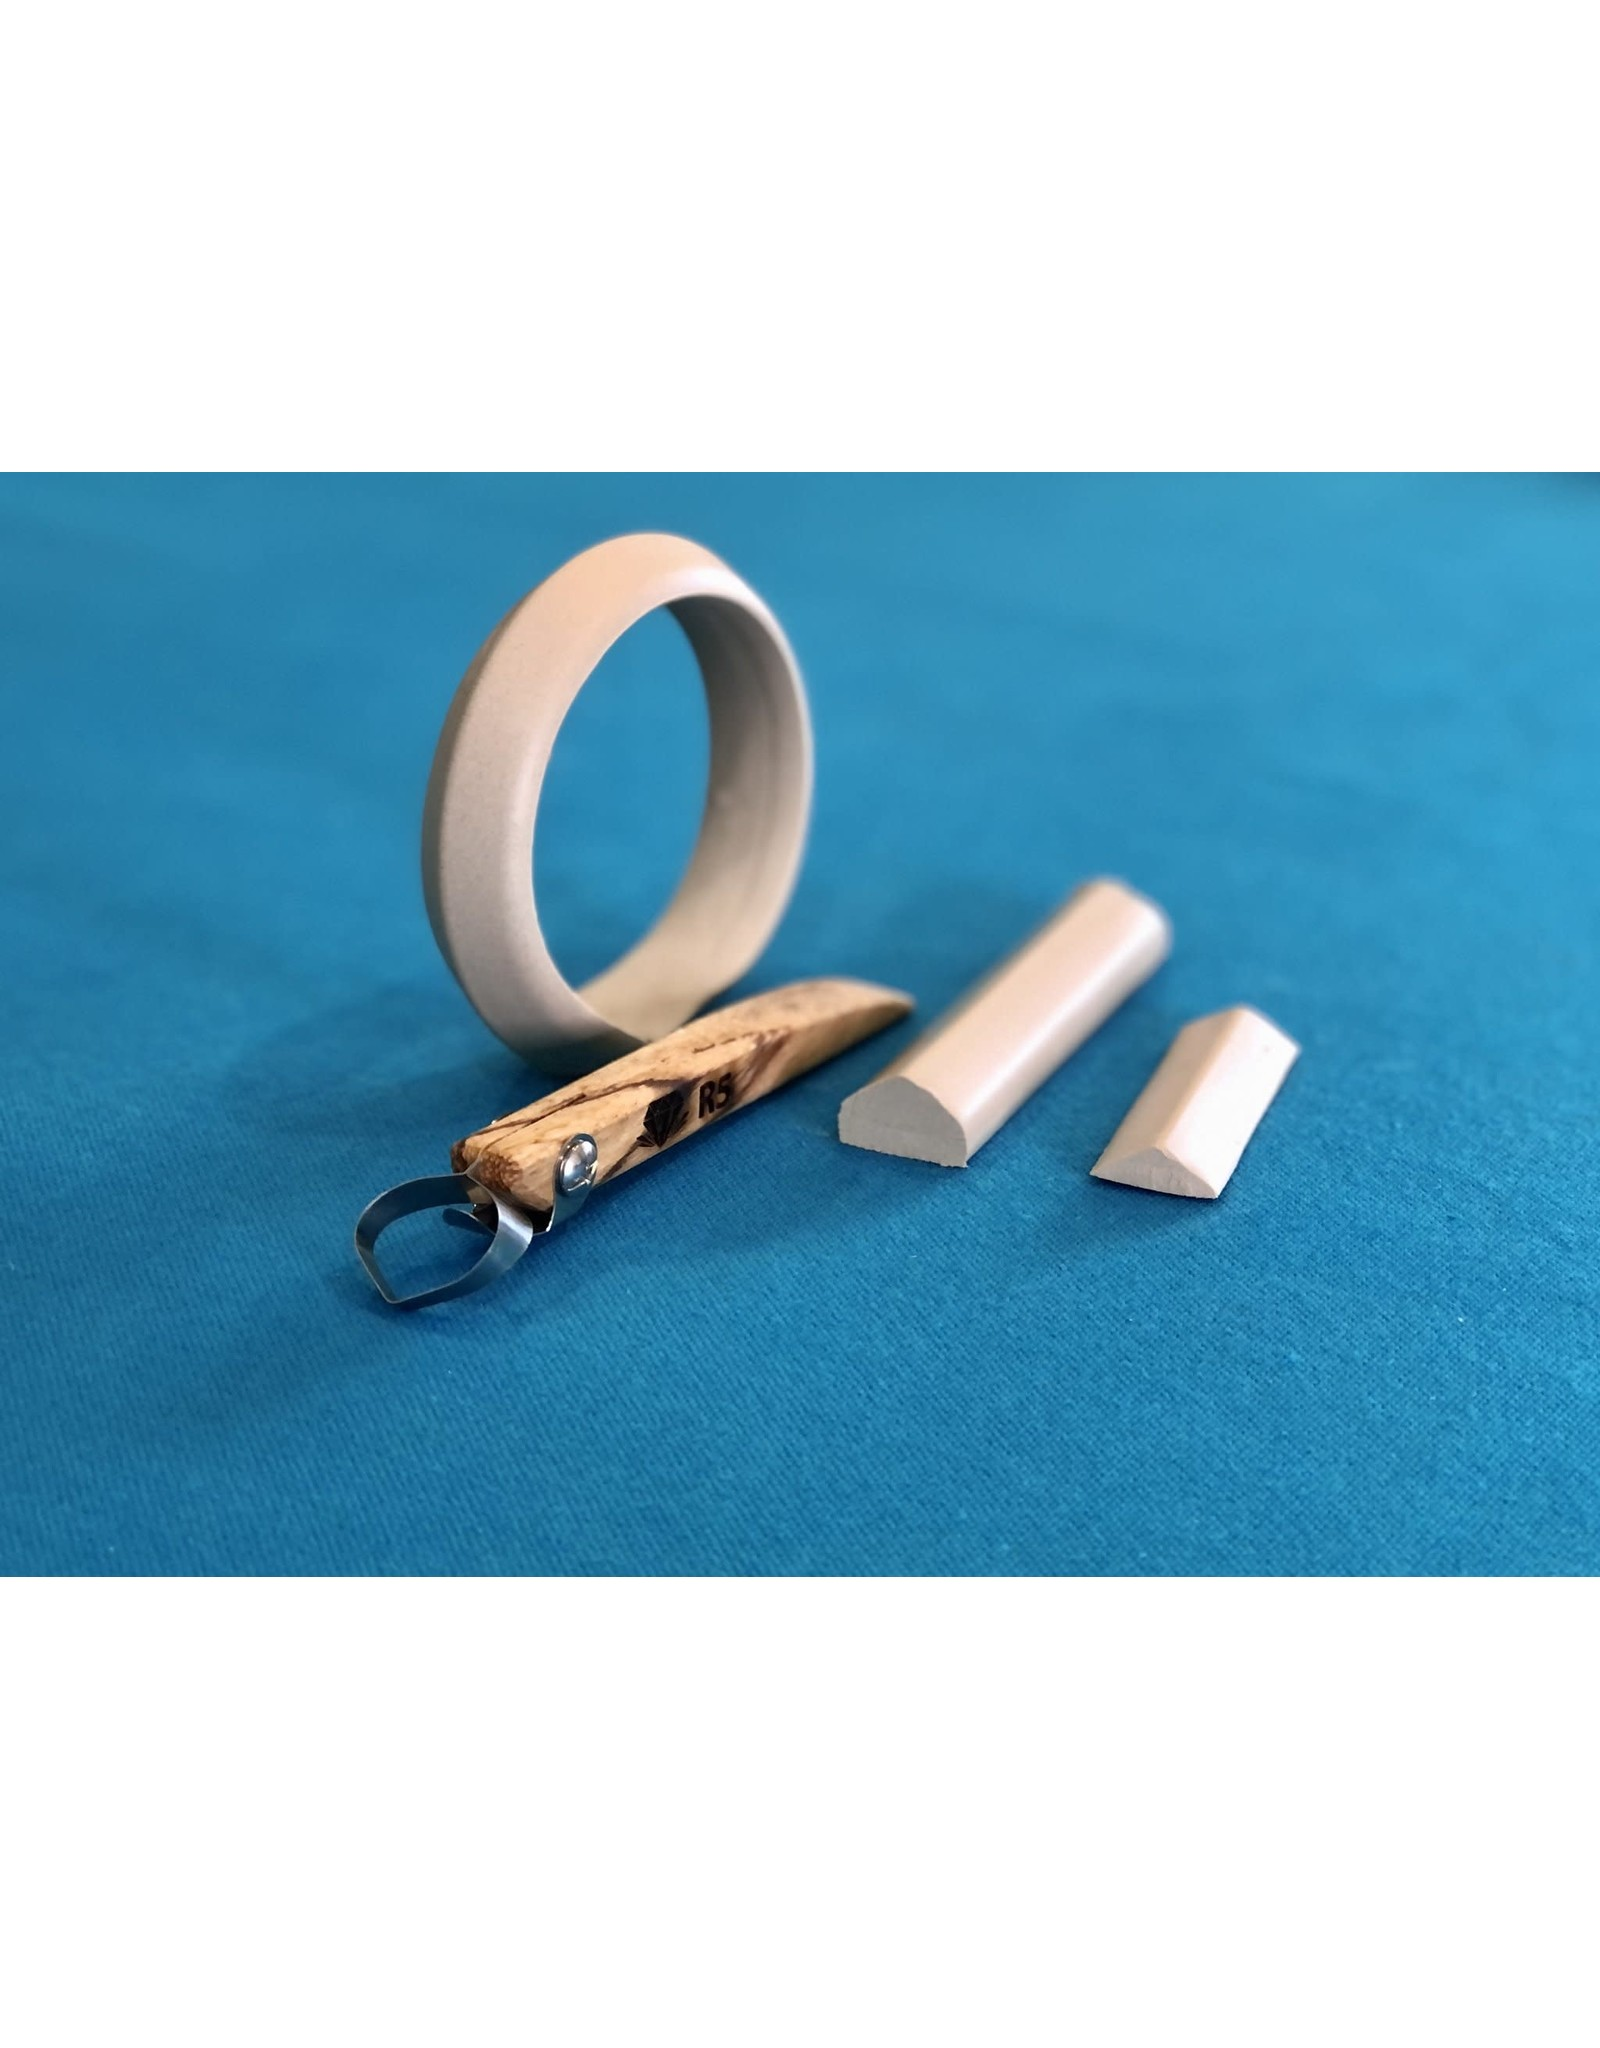 Diamondcore Tools (R5) Middle Ridge Handheld Clay Extruder